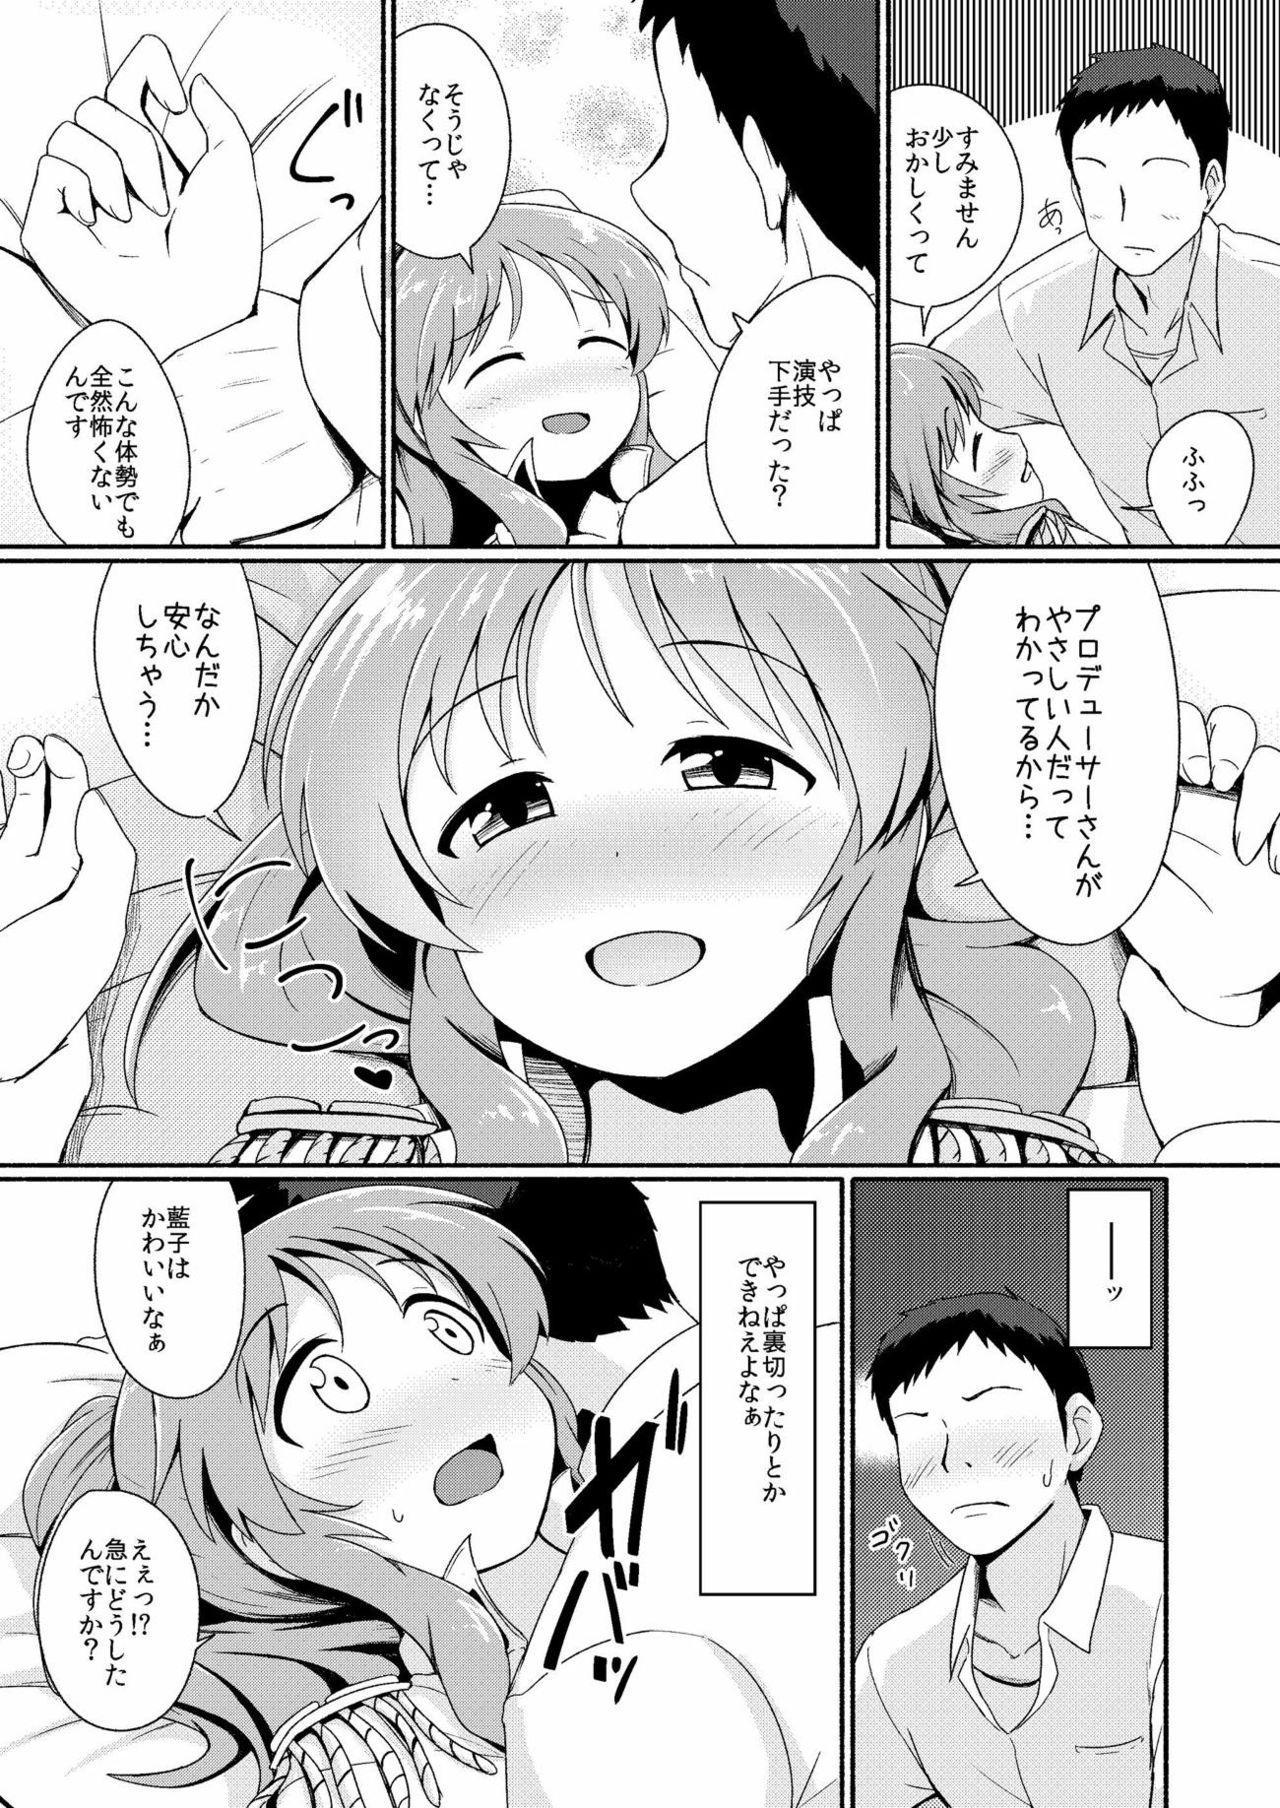 Aiko Myu Endless 4 4